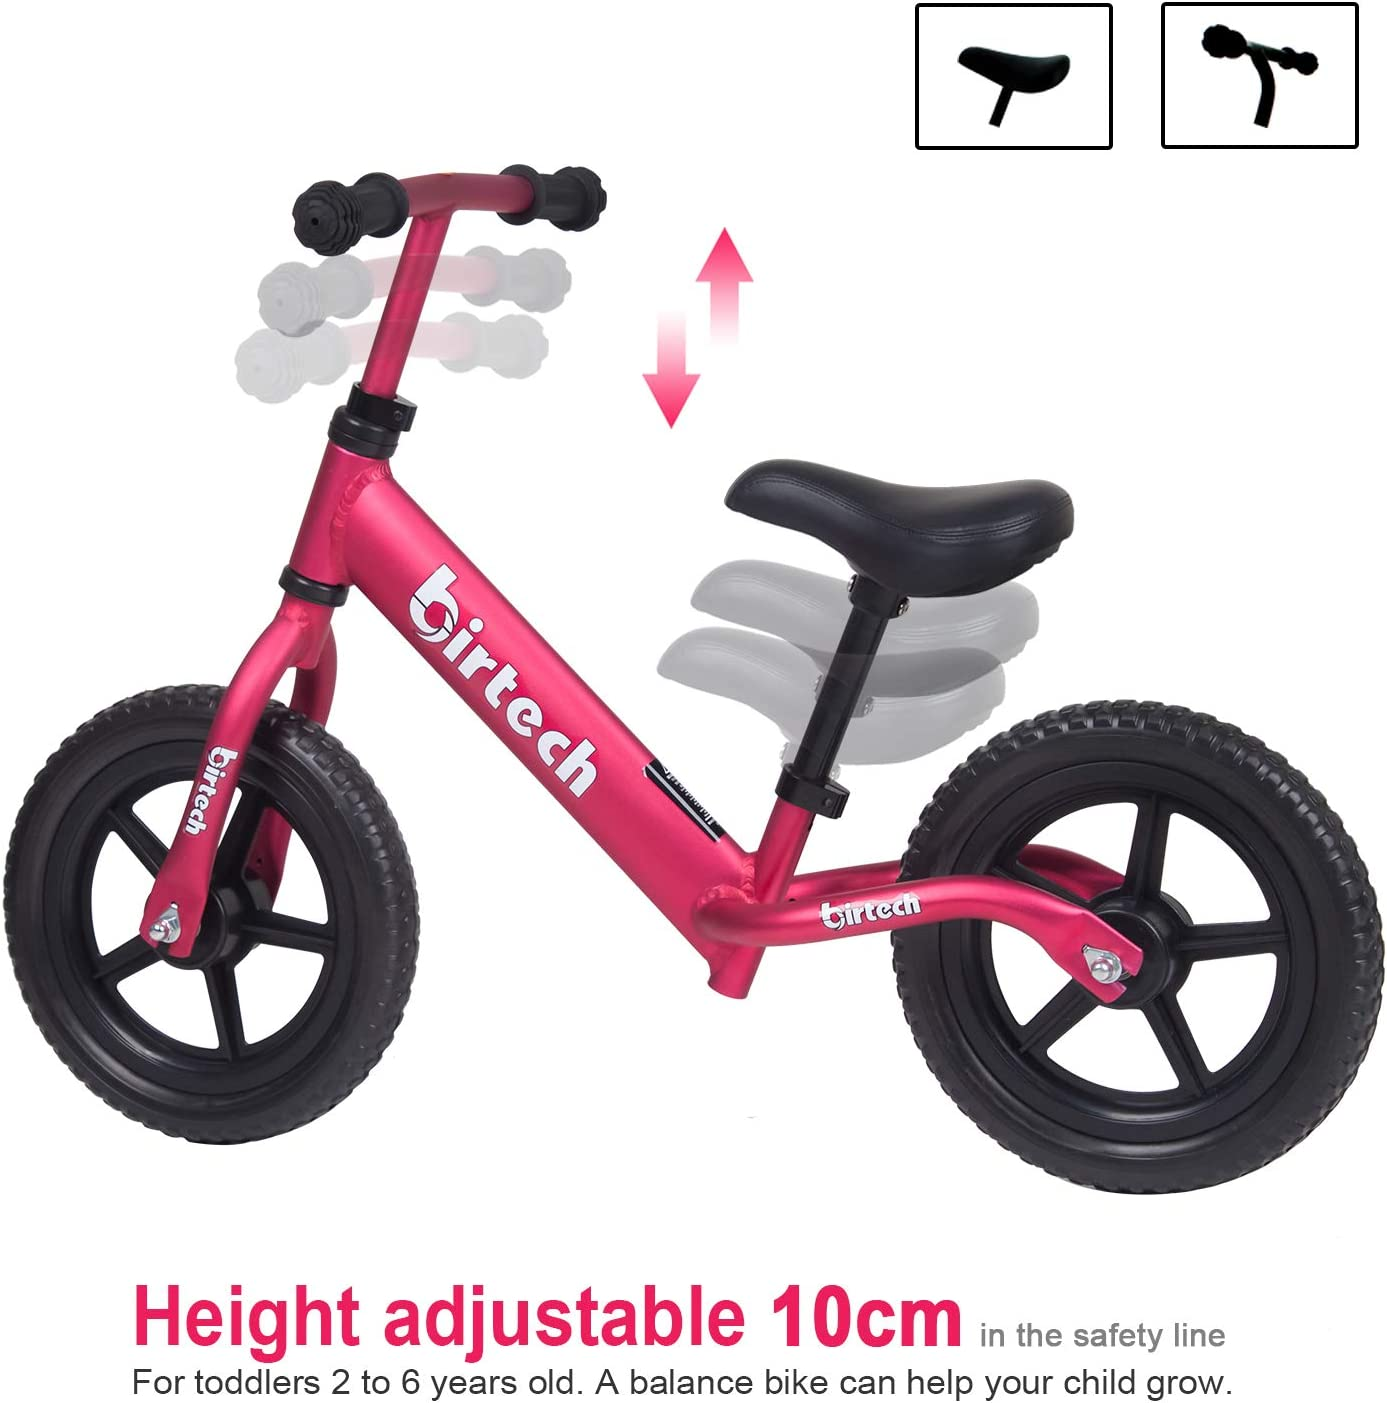 Lightweight Aluminum Alloy Frame Kids Walking Balance Bike No Pedal Training Bicycle for 2-6 Years Old Kids Toddlers 12 Balance Bike for Boys Girls